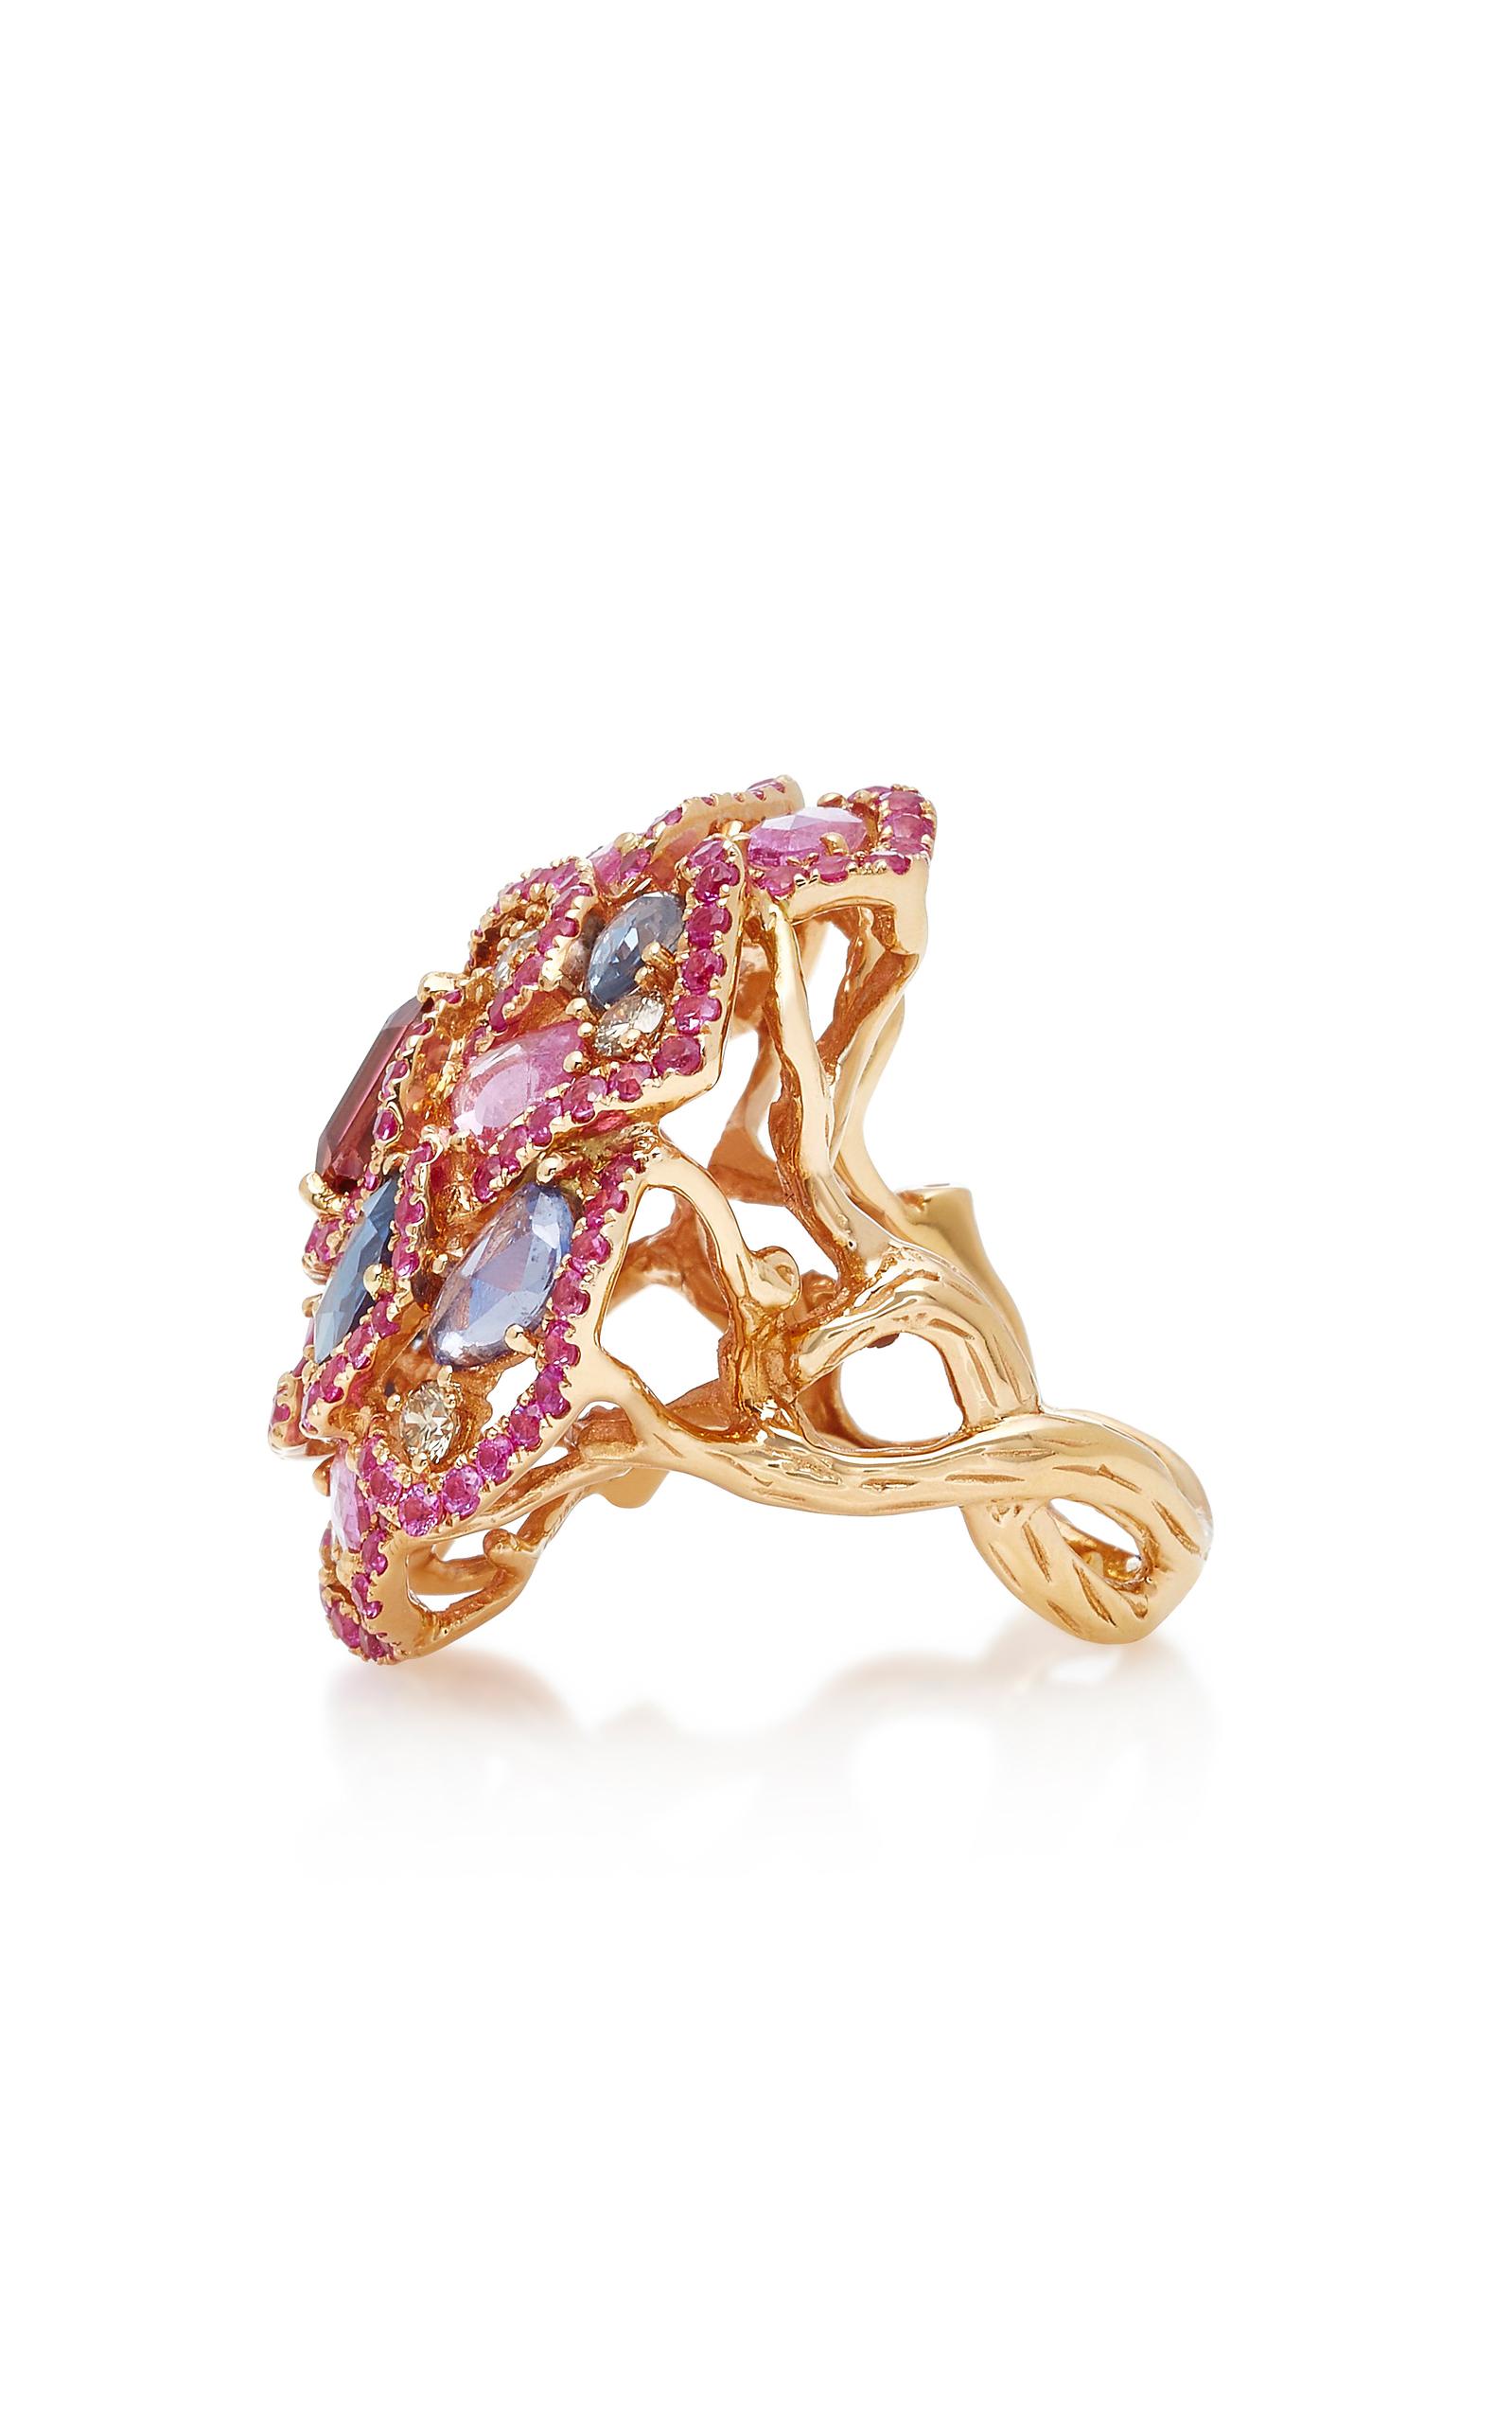 Pink Sapphire Flower Ring By Wendy Yue Moda Operandi